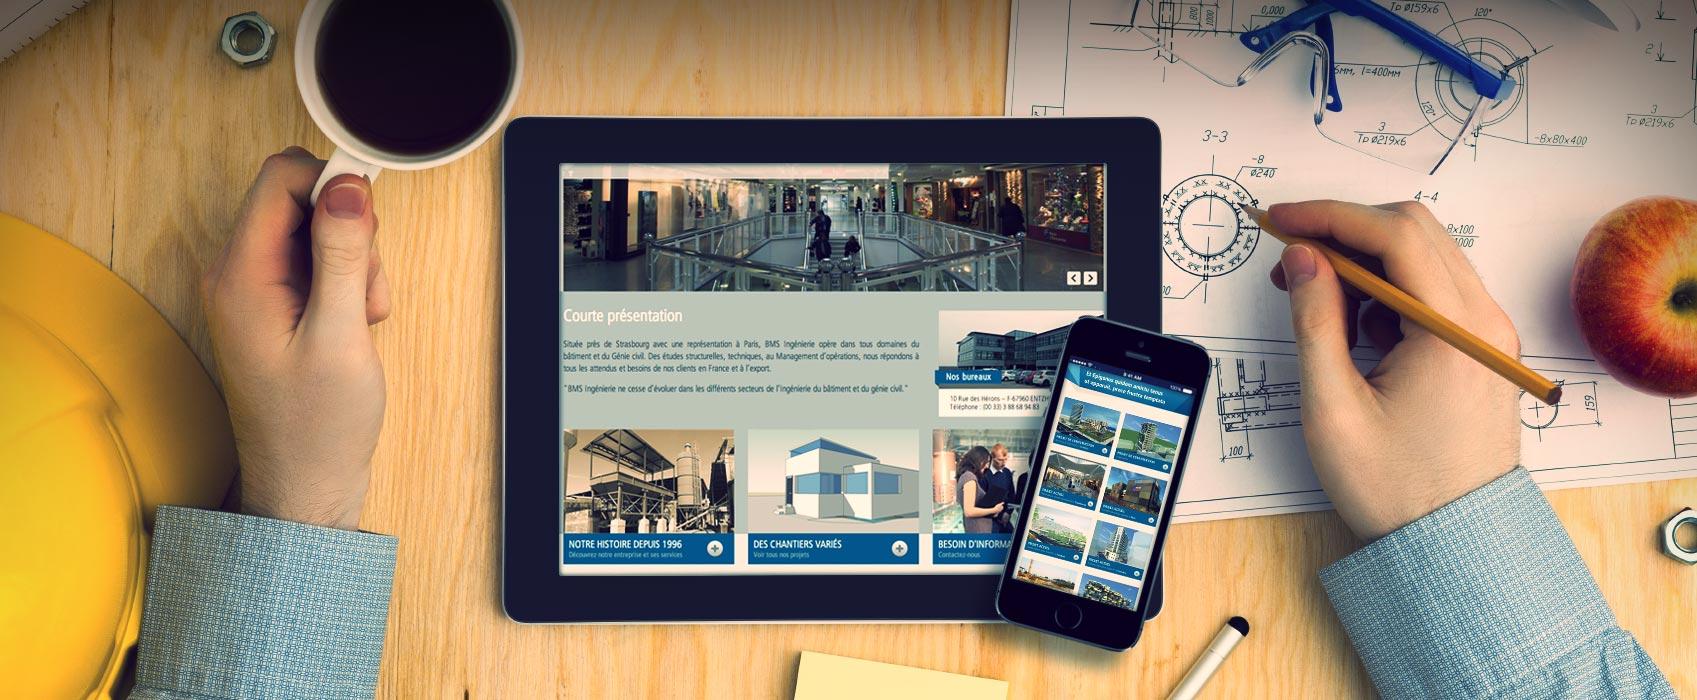 WEB DESIGN ET CHART GRAPHIQUE TUNISIE